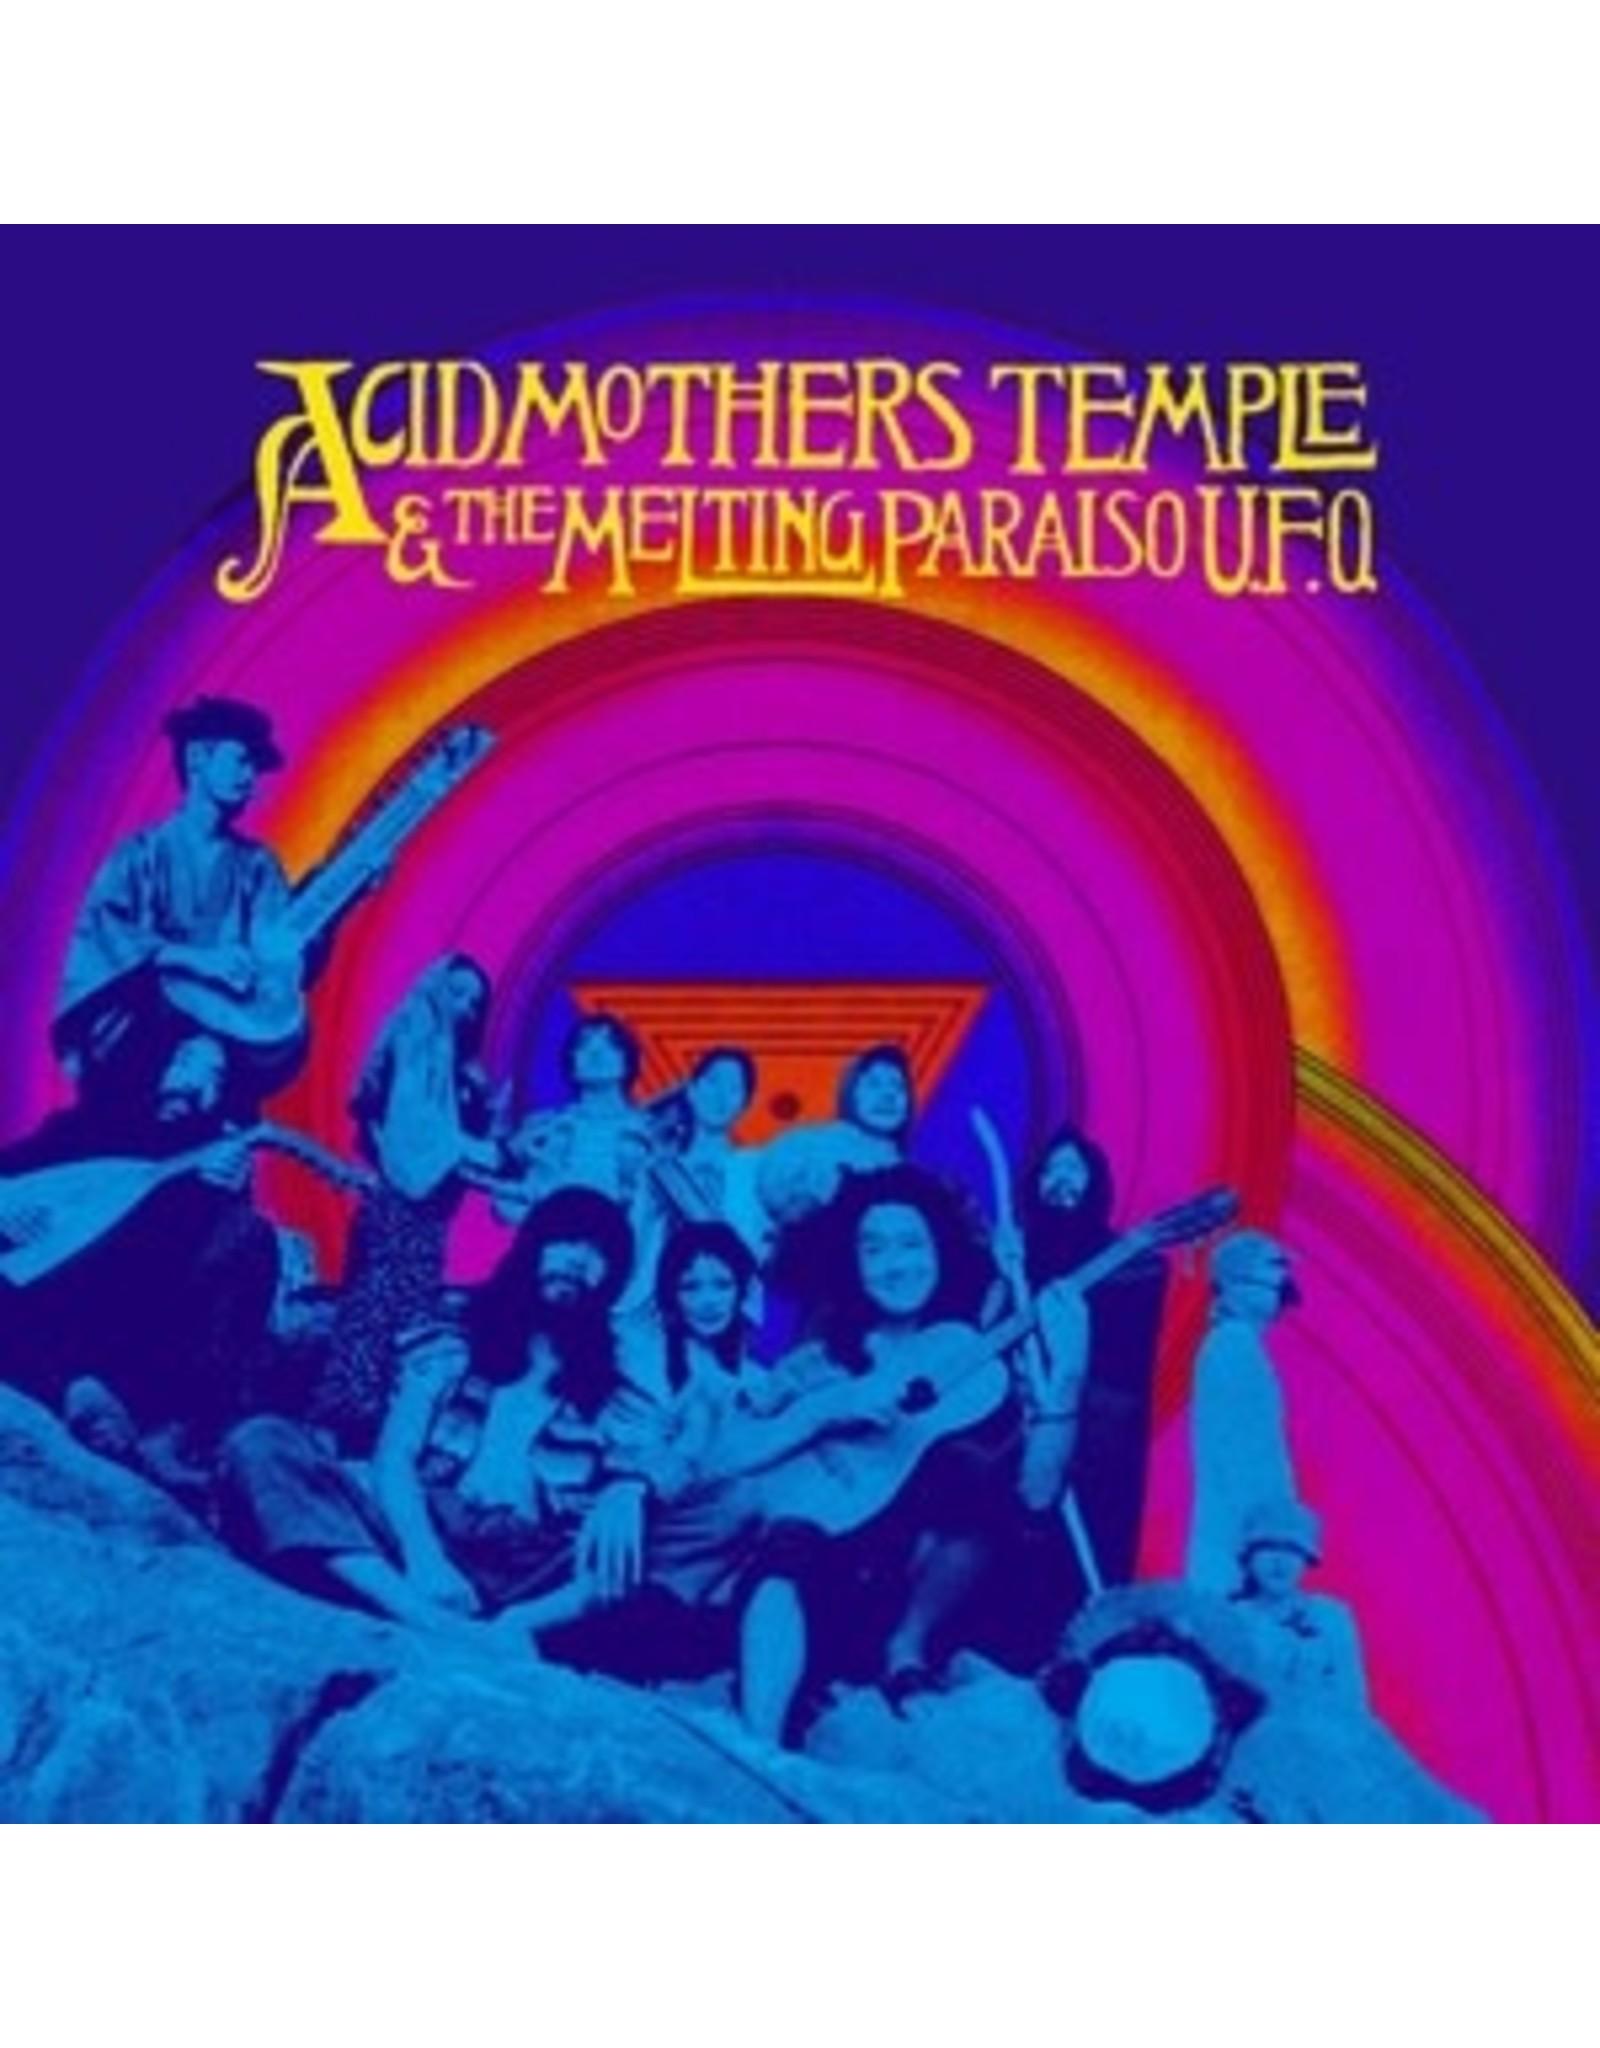 Black Editions Acid Mothers Temple & The Melting Paraiso U.F.O.: s/t LP